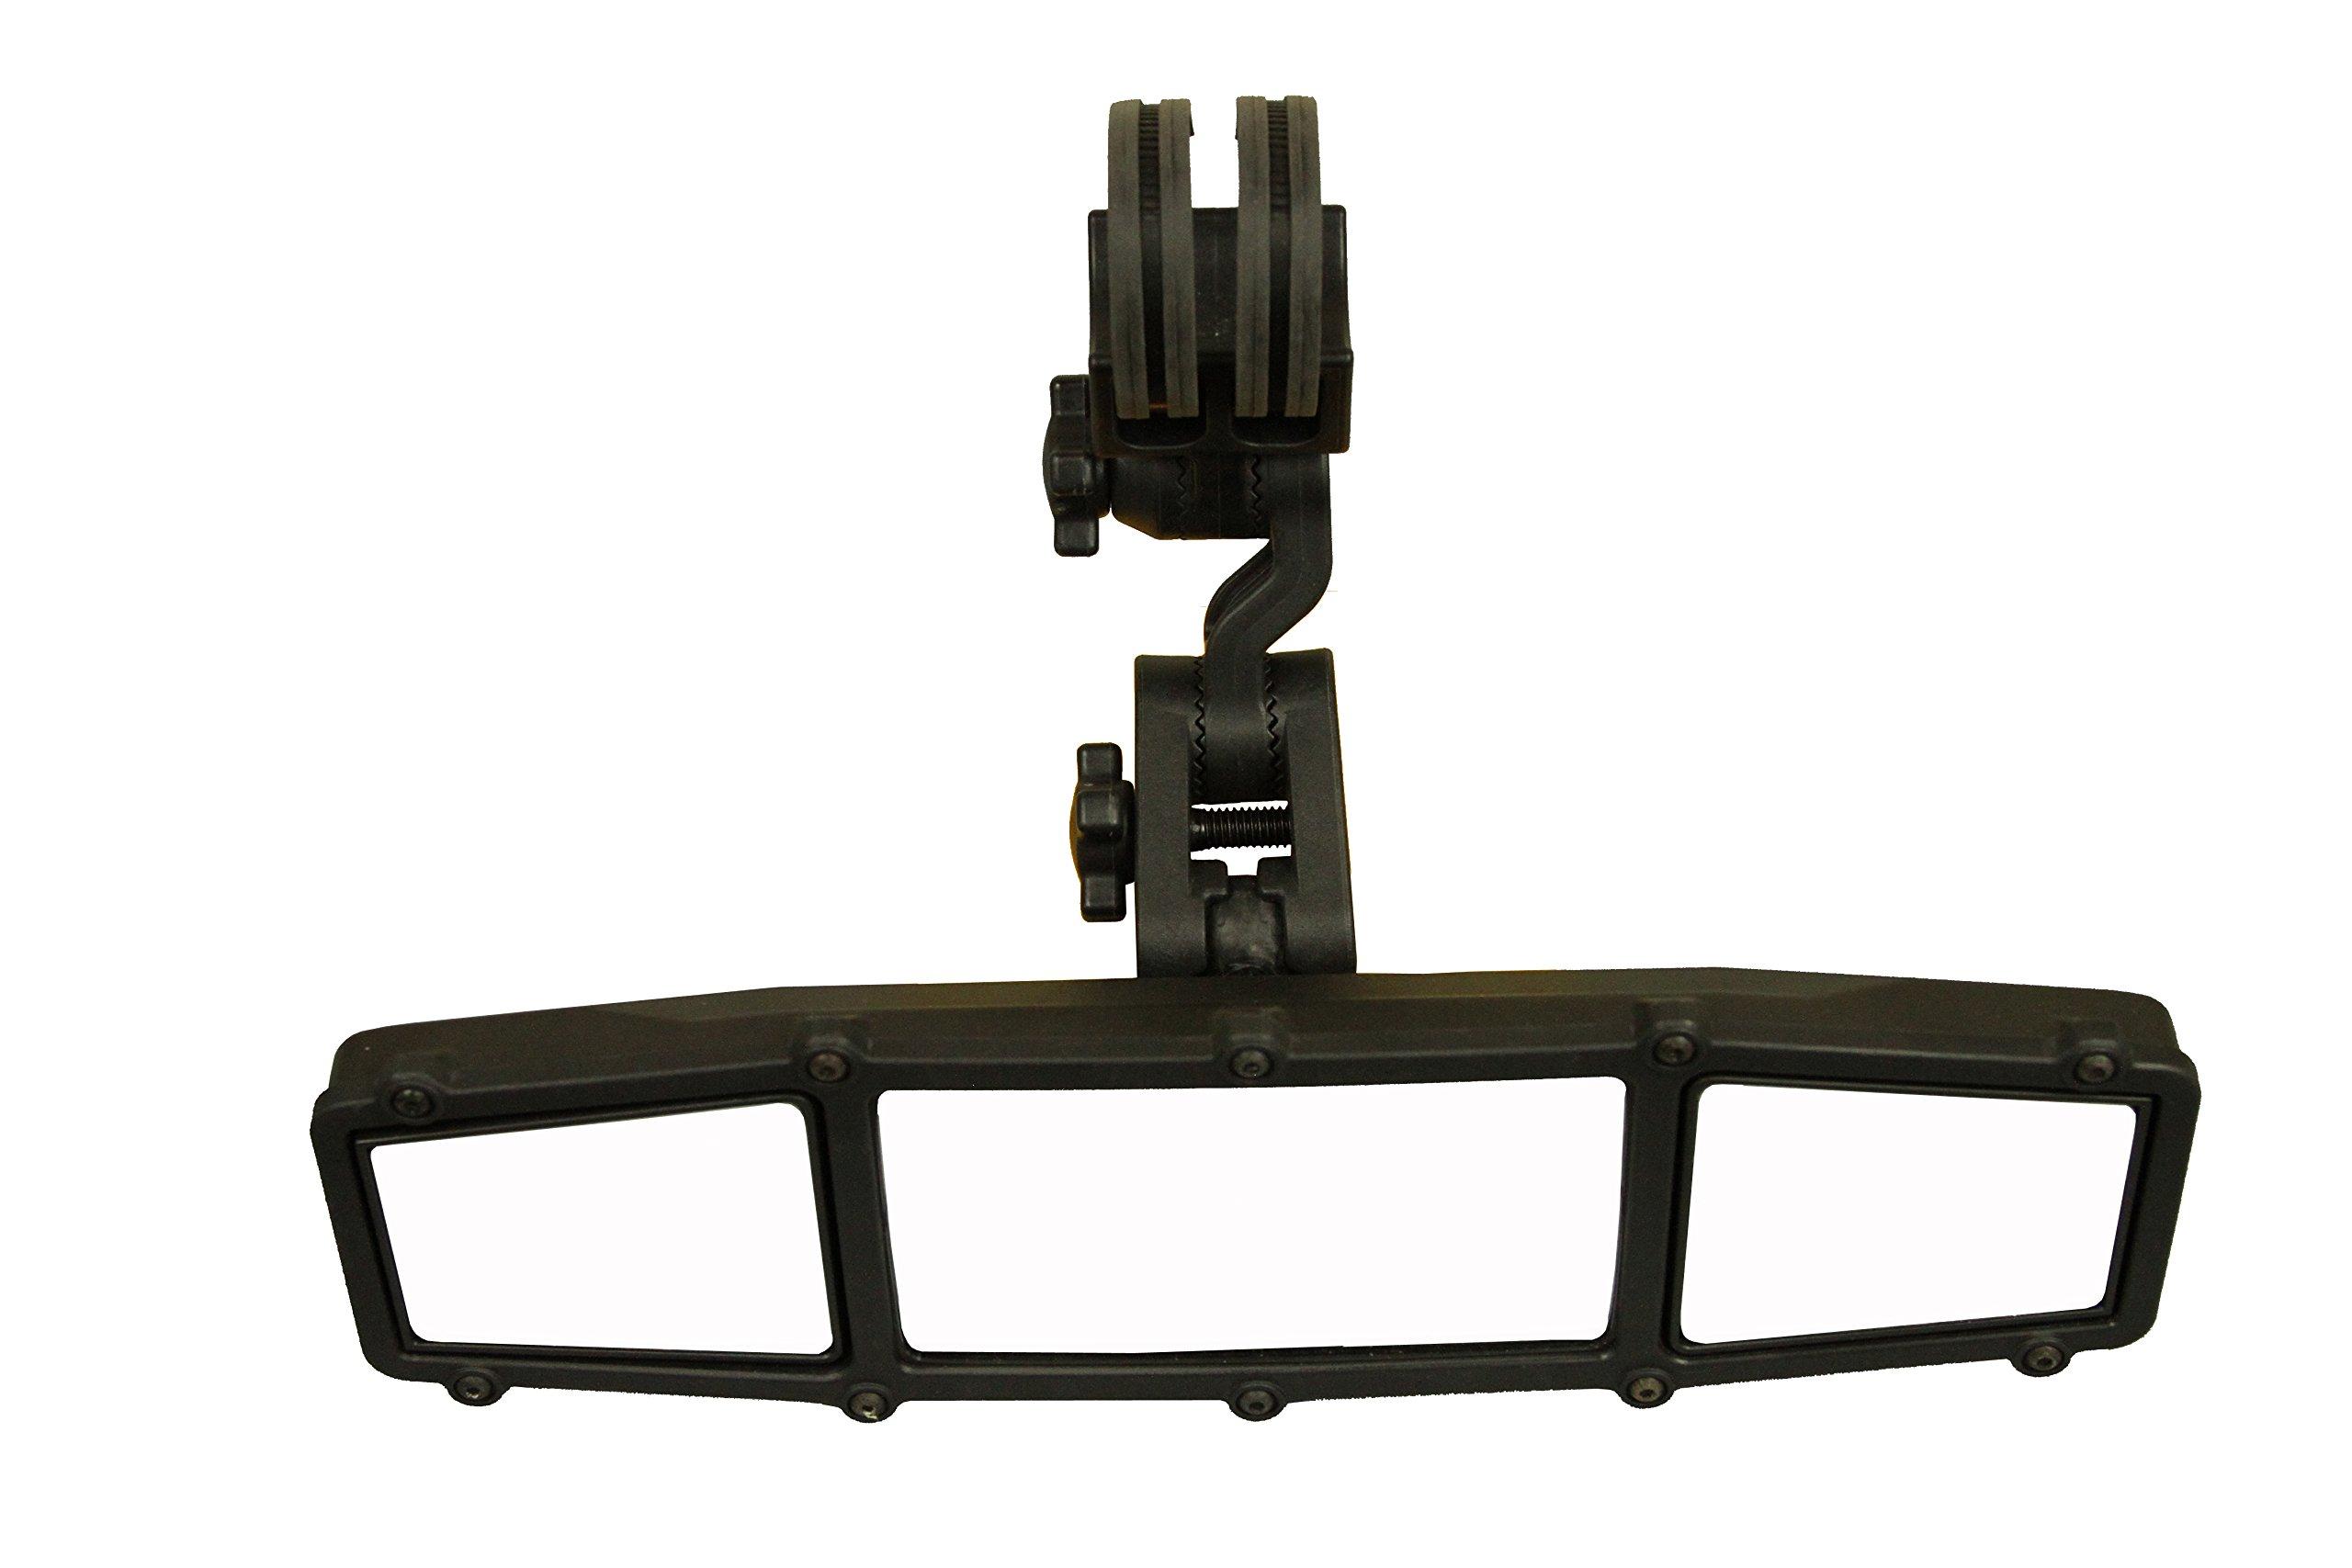 ATV Tek UTVMIRCTR-ES1 Elite UTV Deluxe Adjustable Mount Rear View Mirror